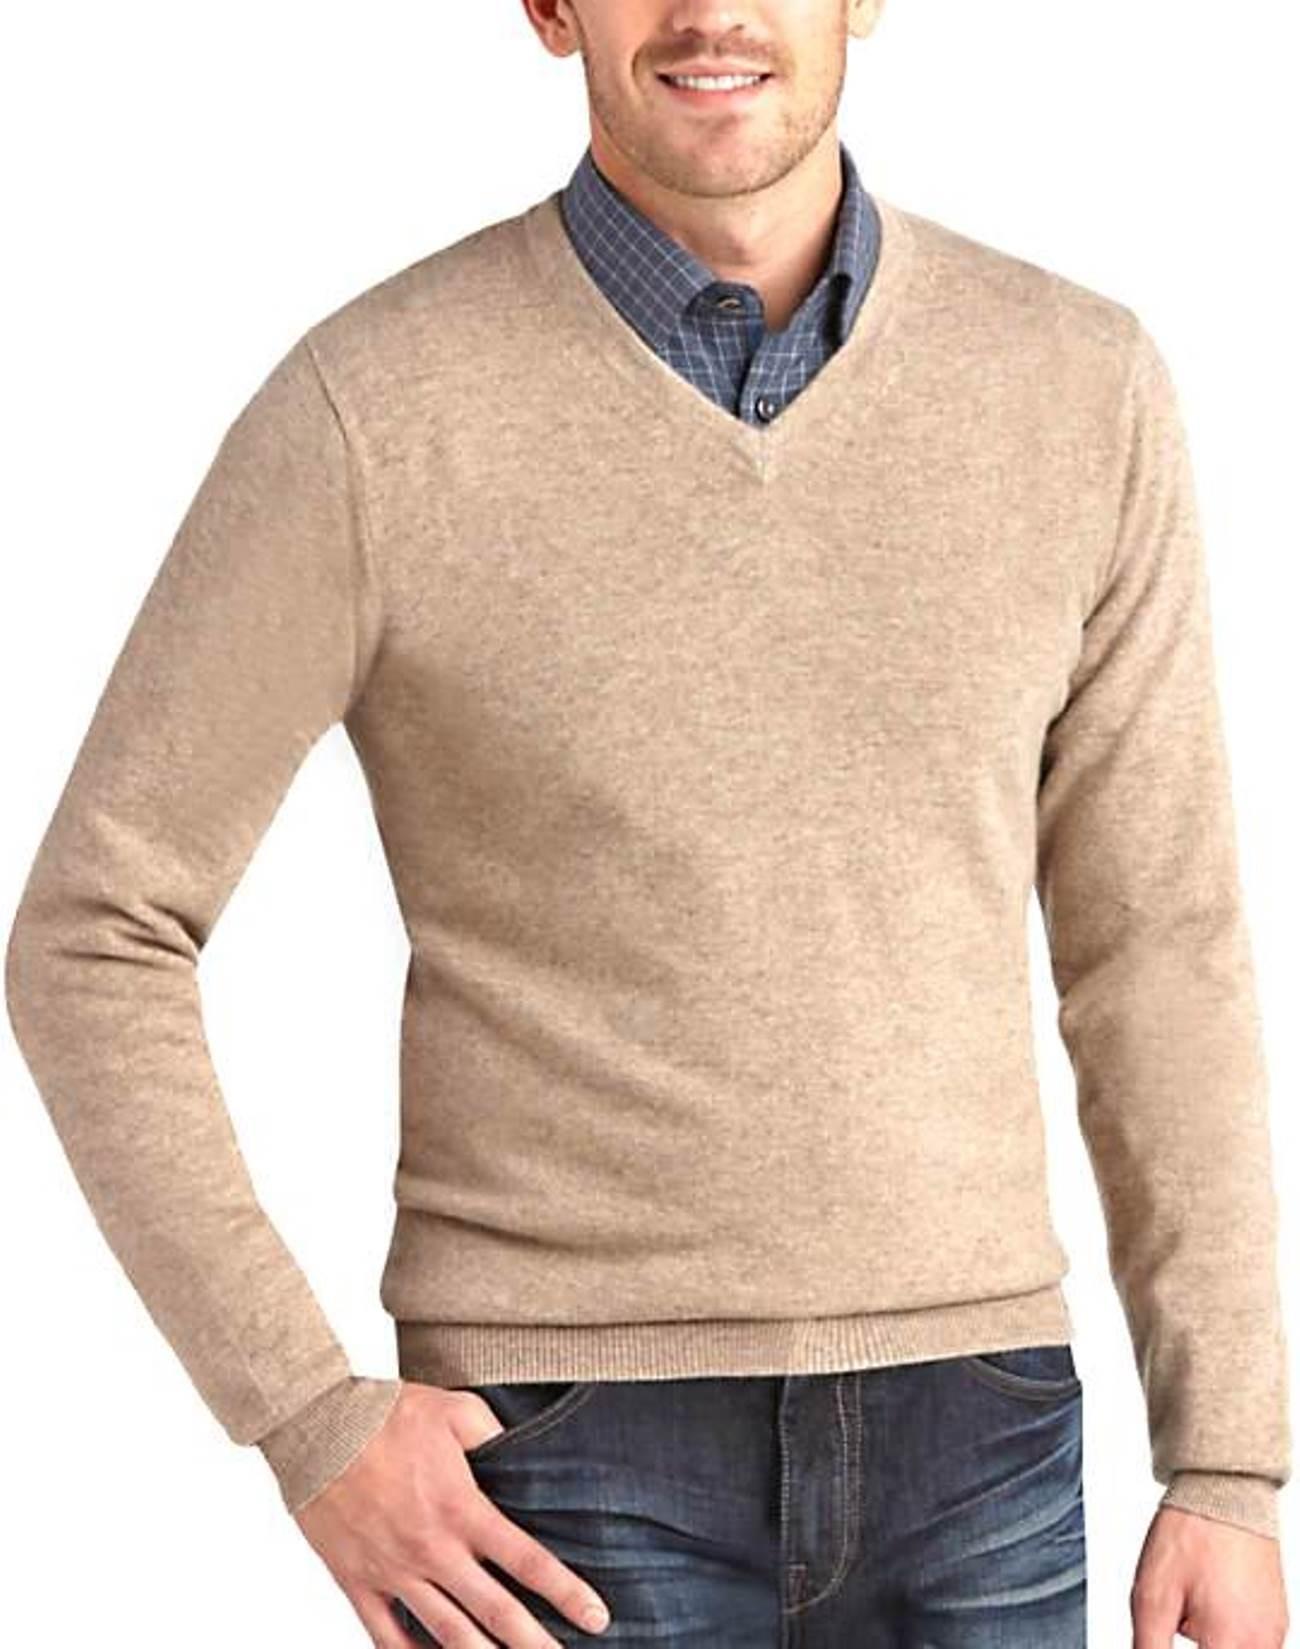 Beige Men's V-Neck Sweaters - 100% Cashmere Made in Scotland